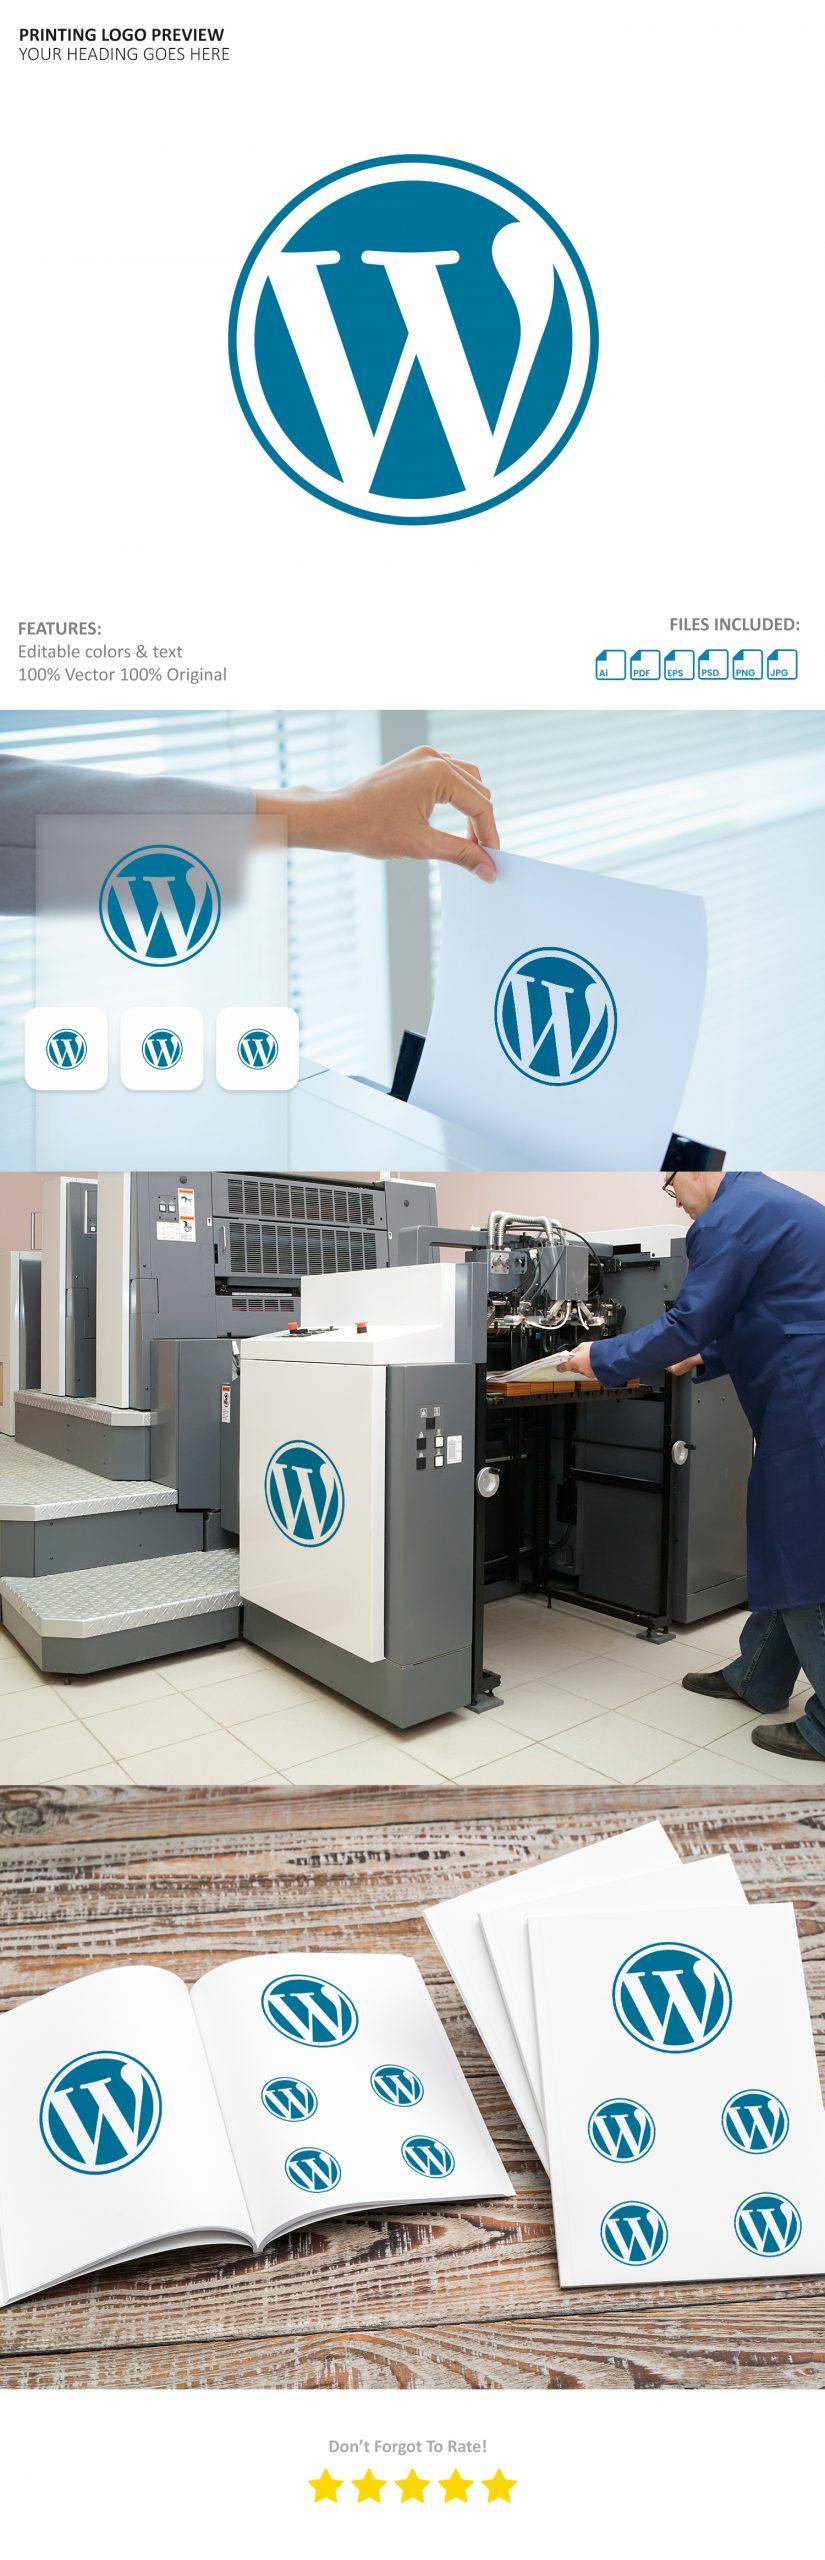 Printing Business Logo Preview Generator Free Download